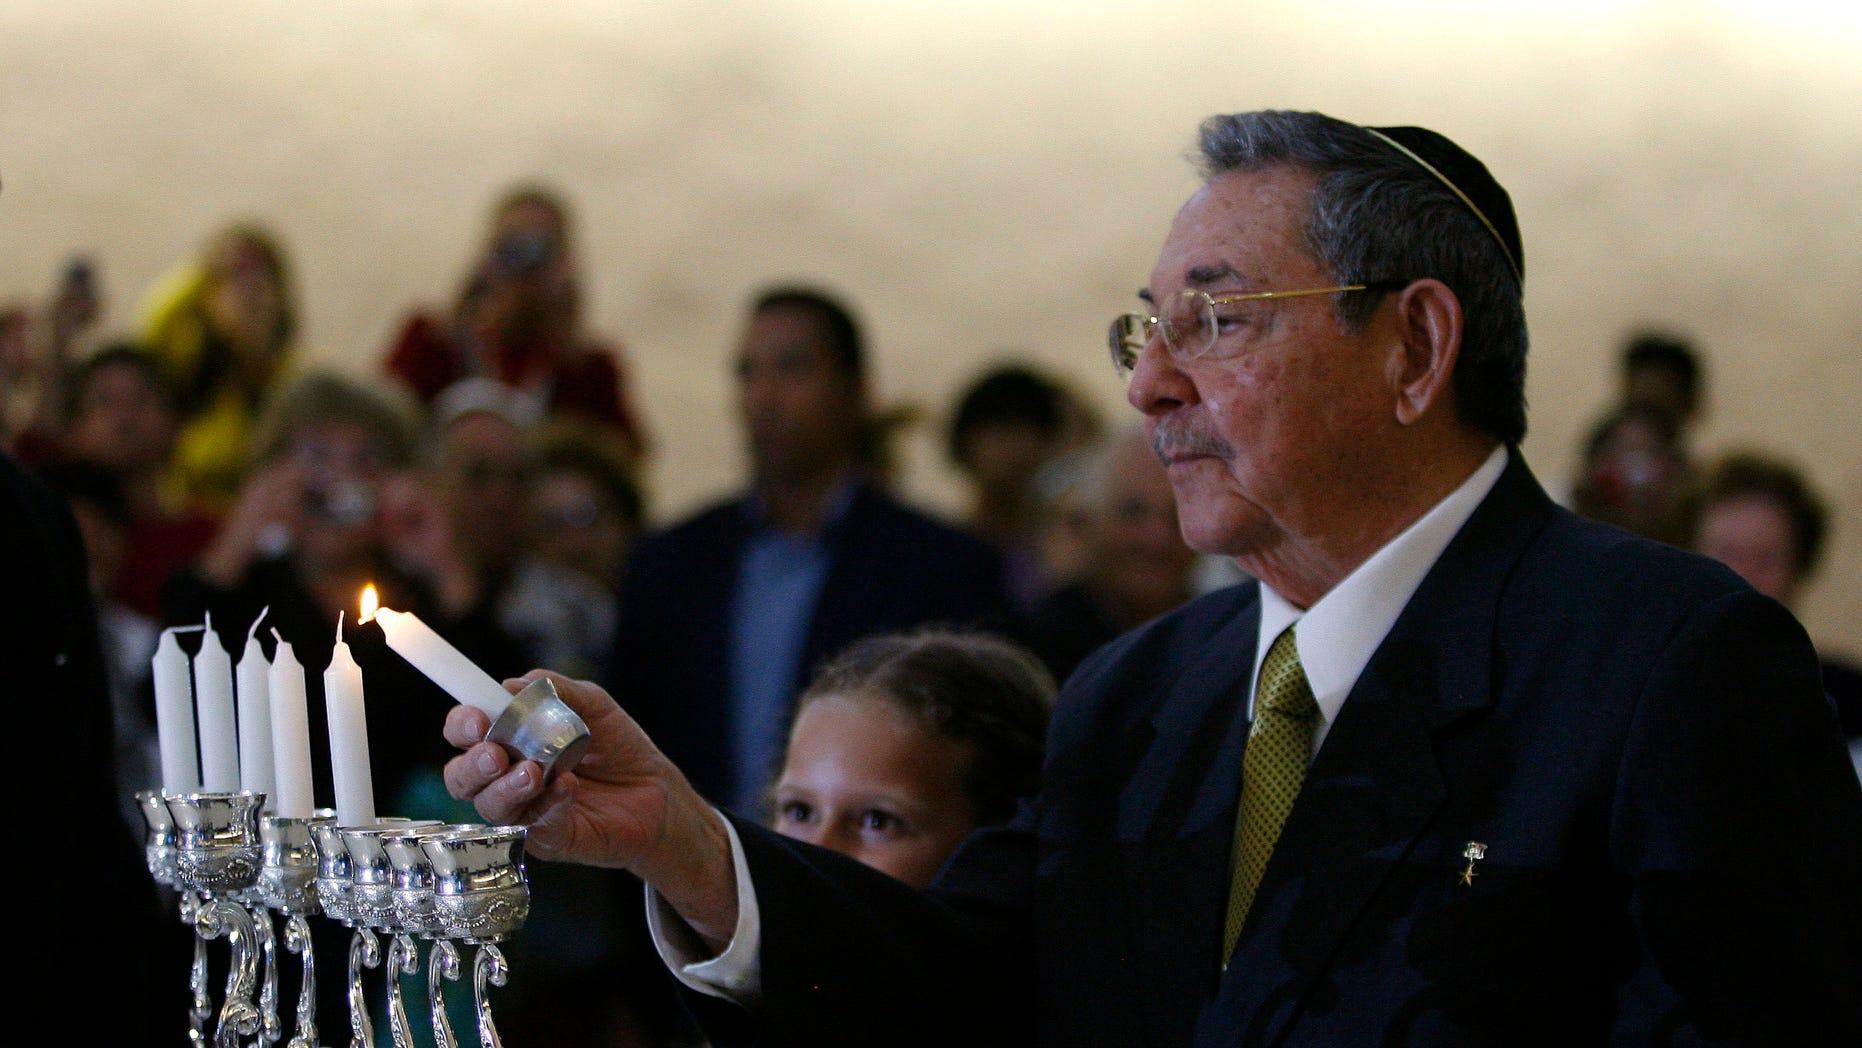 Cuba's President Raul Castro lights a Hanukkah candle during a ceremony at the Bet Shalom synagogue in Havana, Cuba, Sunday Dec. 5, 2010.  (AP Photo/Ismael Francisco, Prensa Latina)